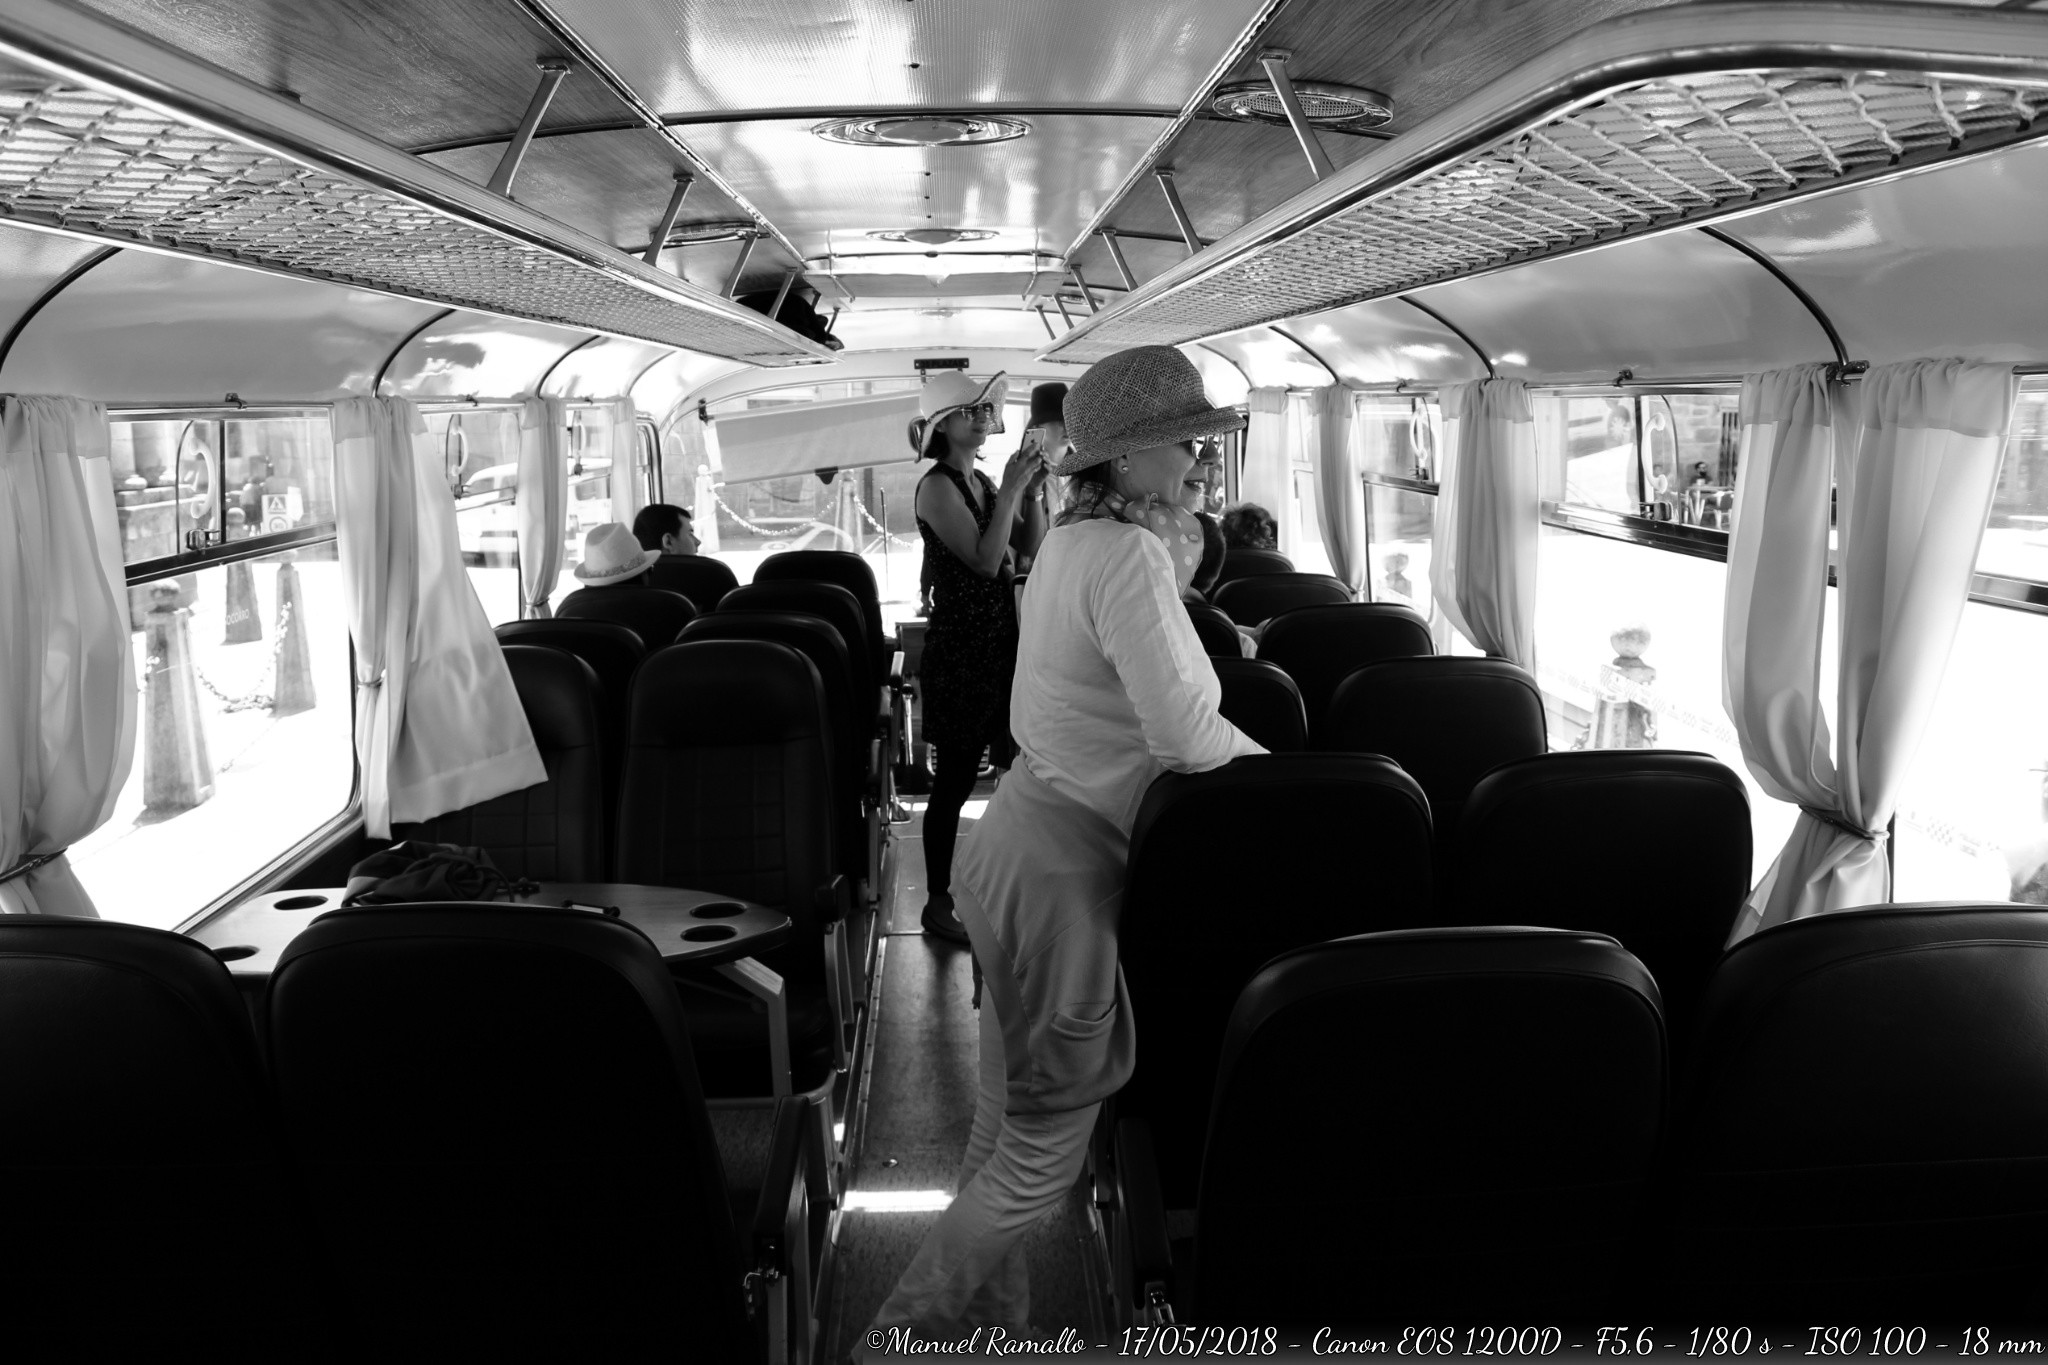 autobus-anos-60-celanova-ourense-blanco-y-negro